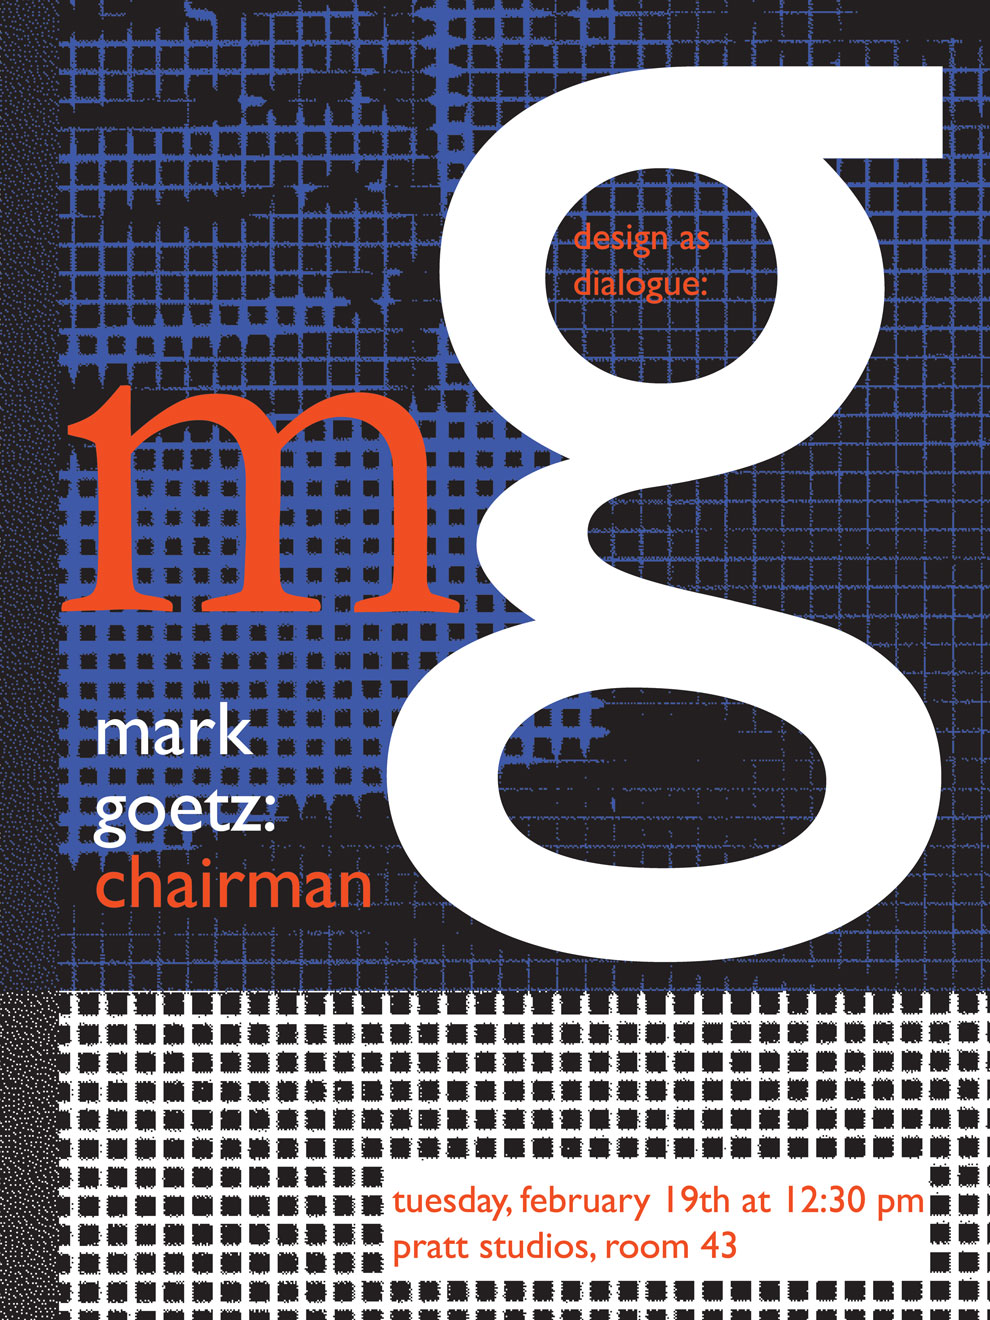 mark goetz, design as dialogue poster